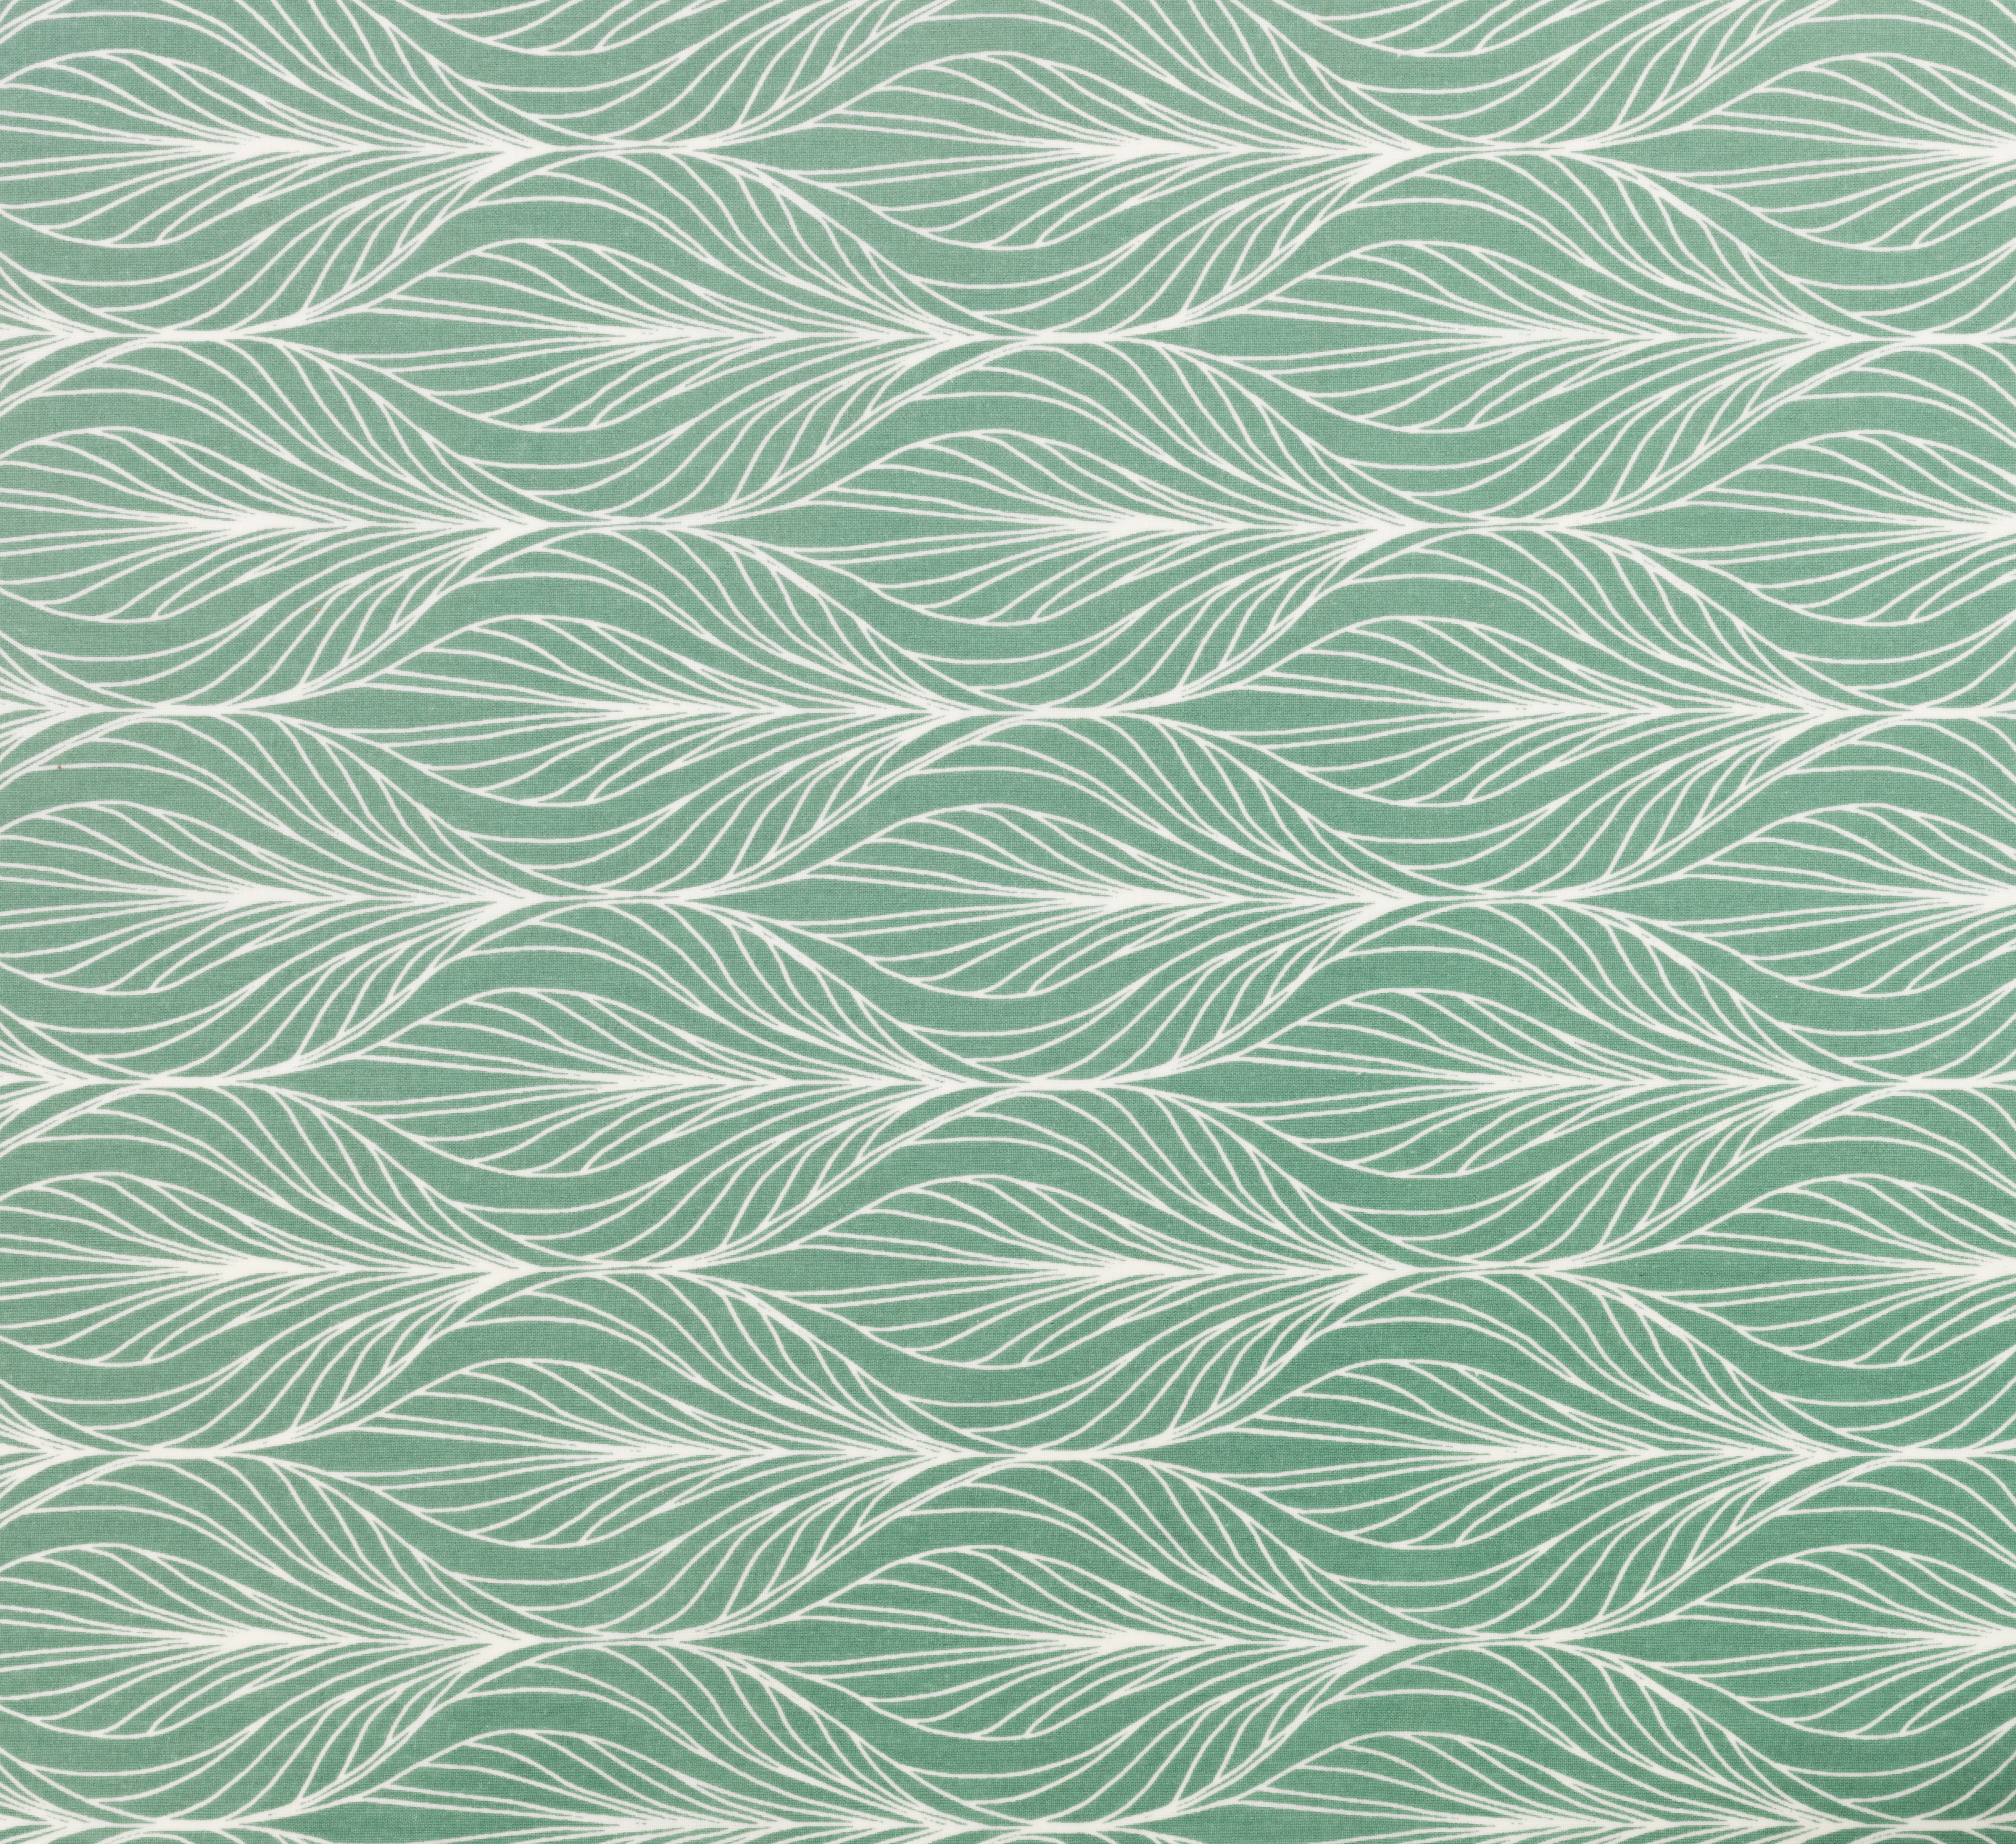 feather-oilcloth